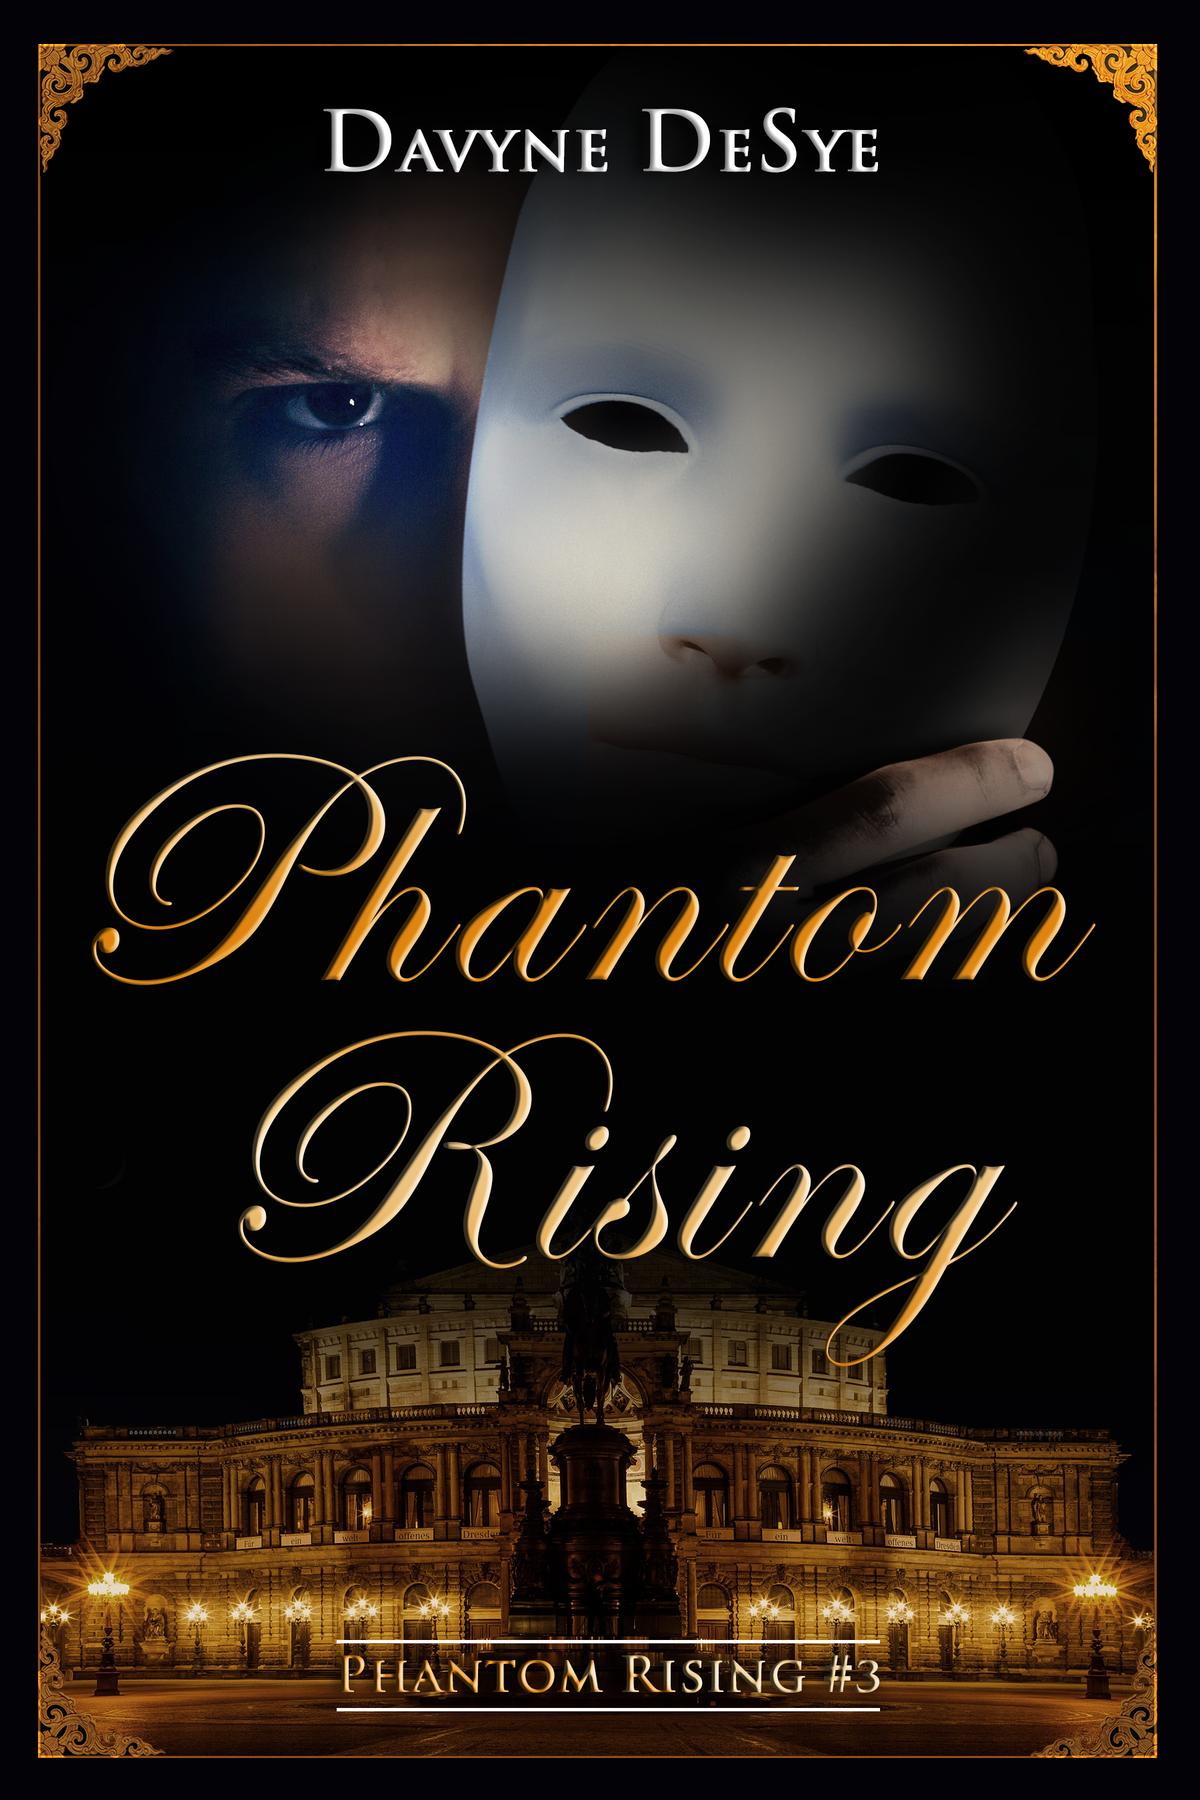 Book Cover for Historical Adventure/Romance Novel